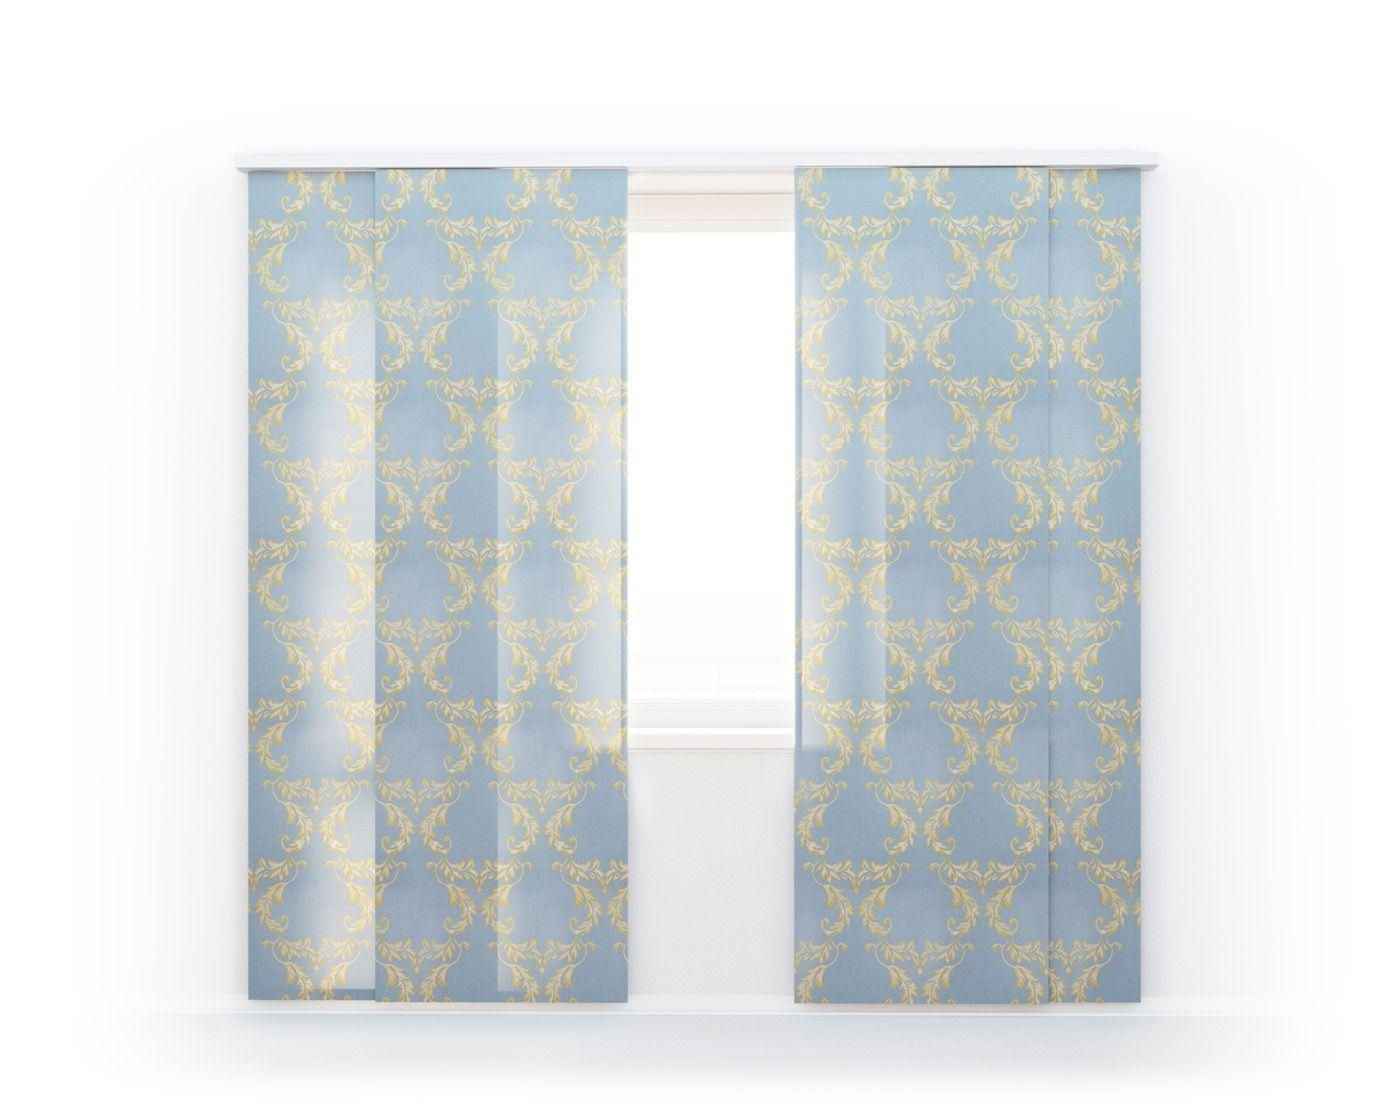 Японские шторы Louis D'or, 2375/45